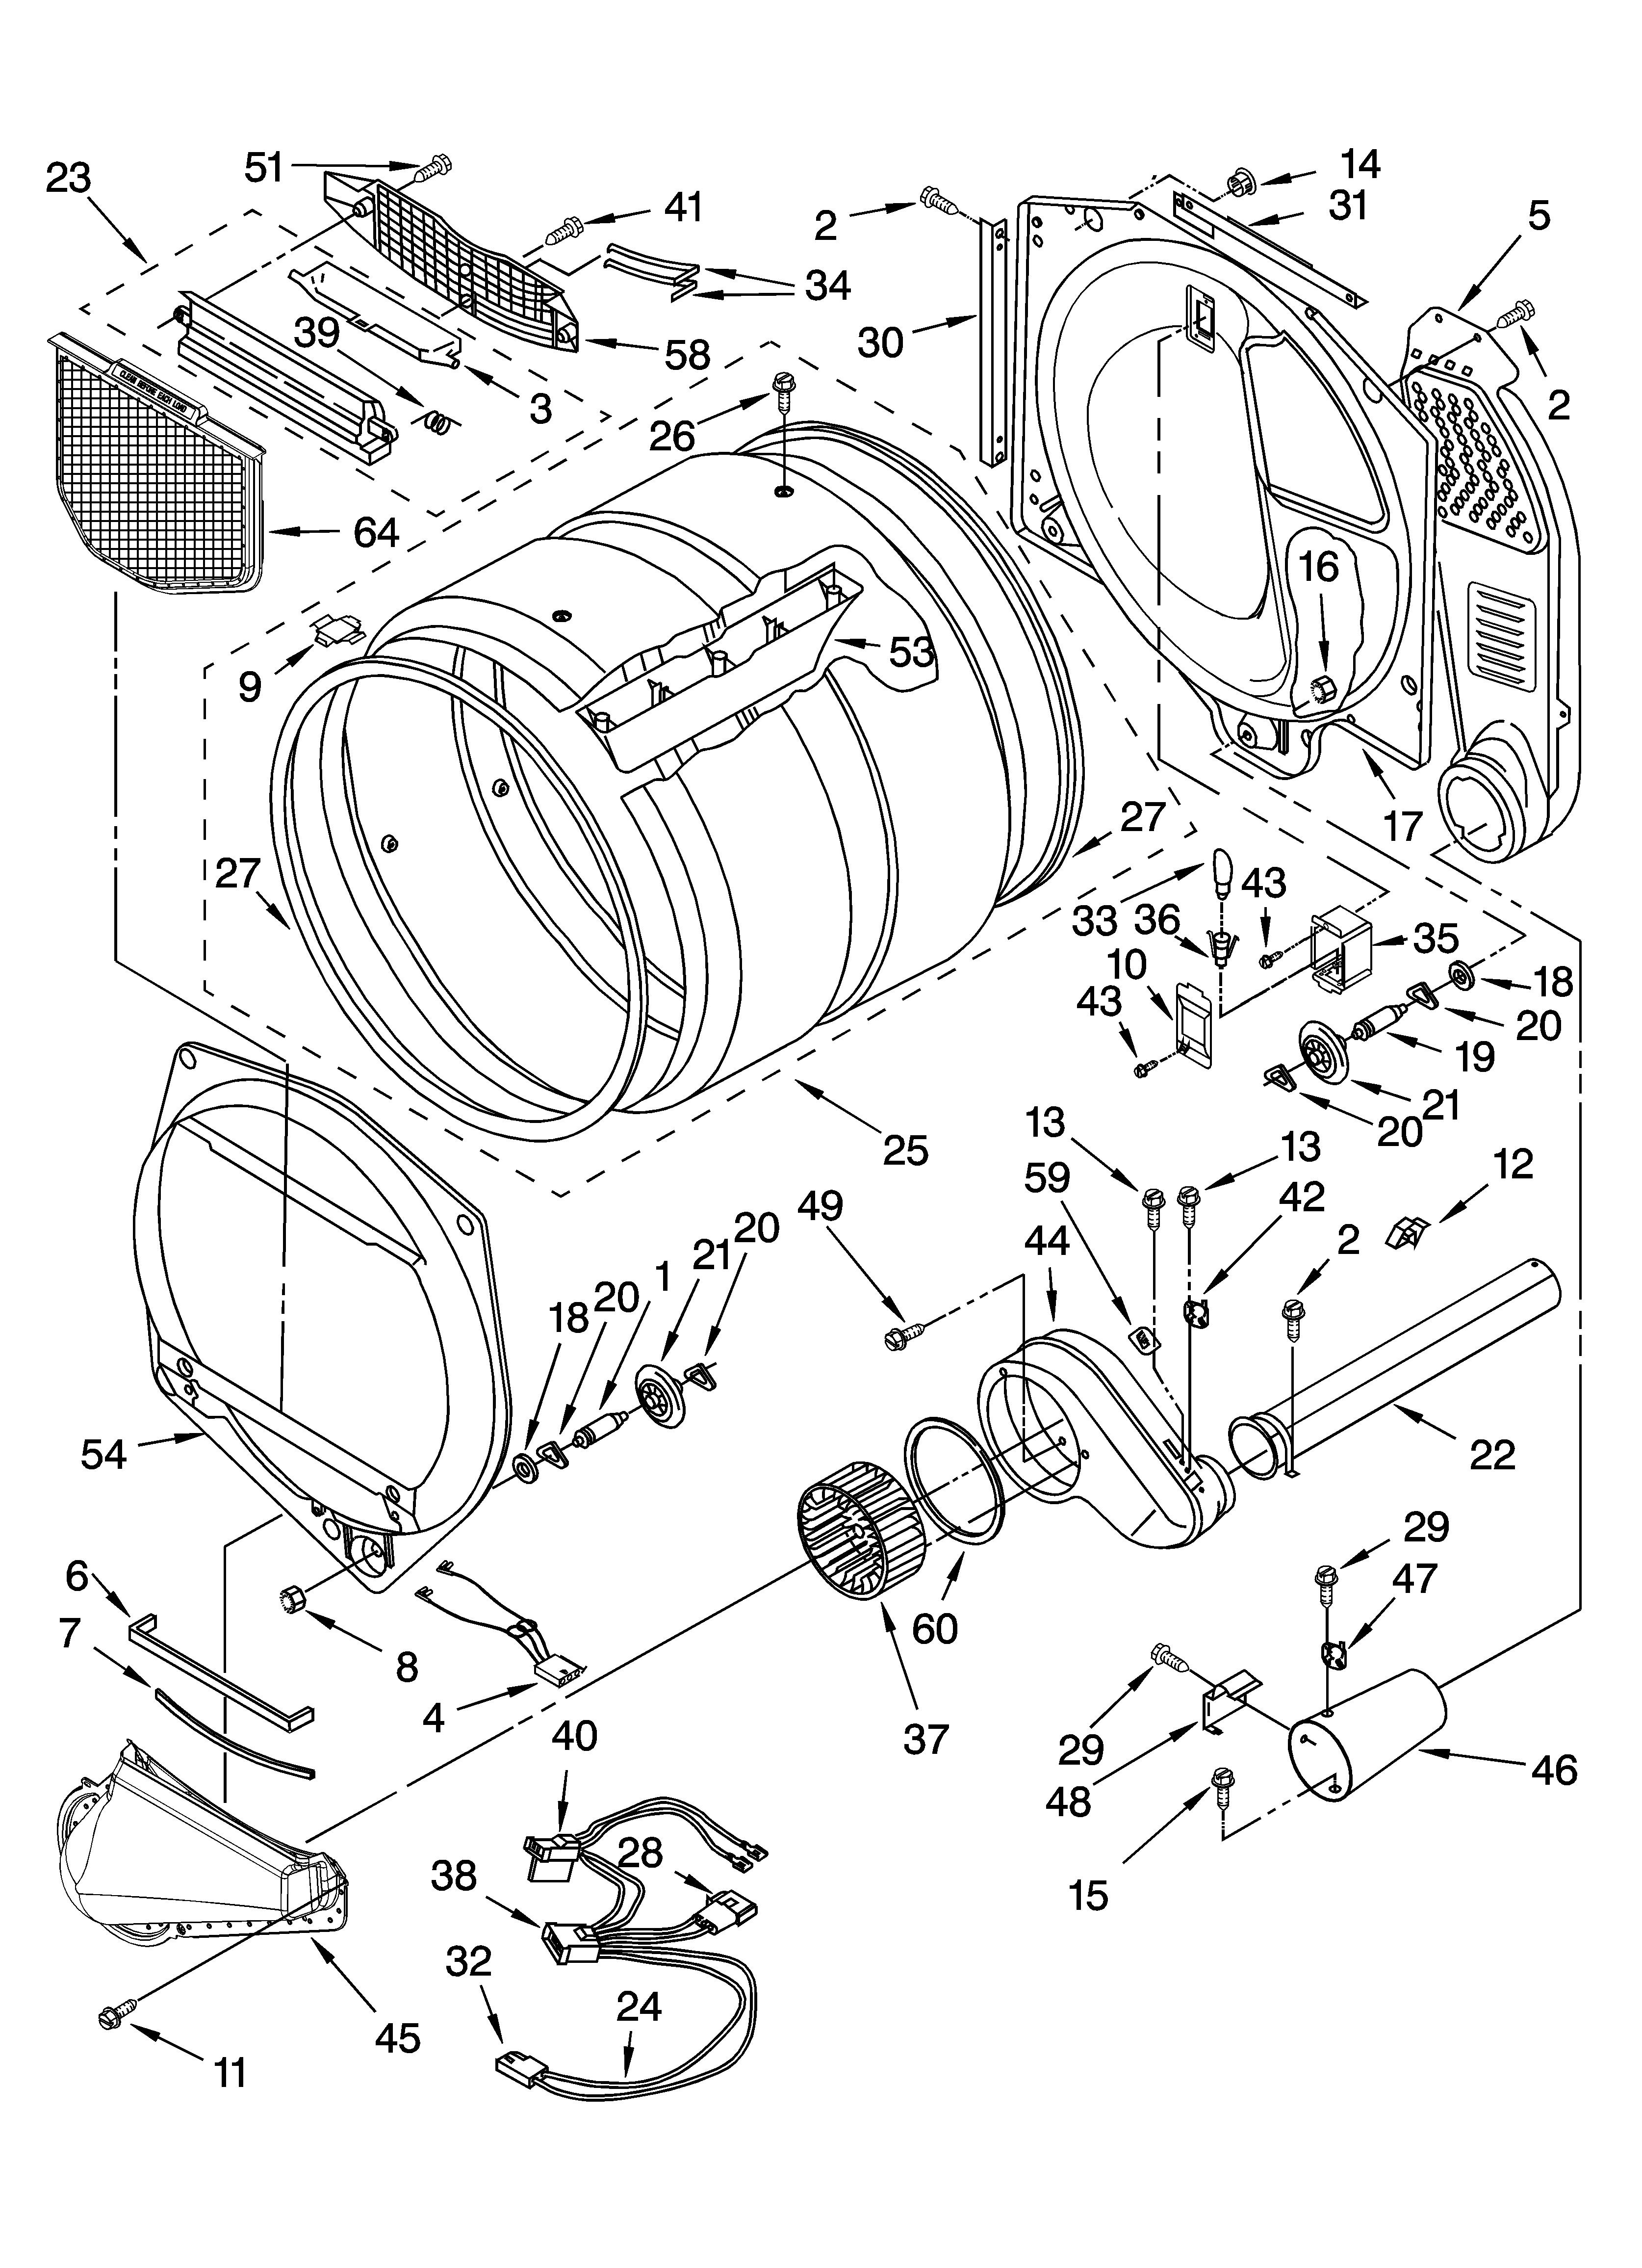 I Have A Whirlpool Duet Gas Dryer When Press The Control On Gew9200lw1 Wiring Diagram Residential Model Ggw9250pw0 Bulkhead Parts